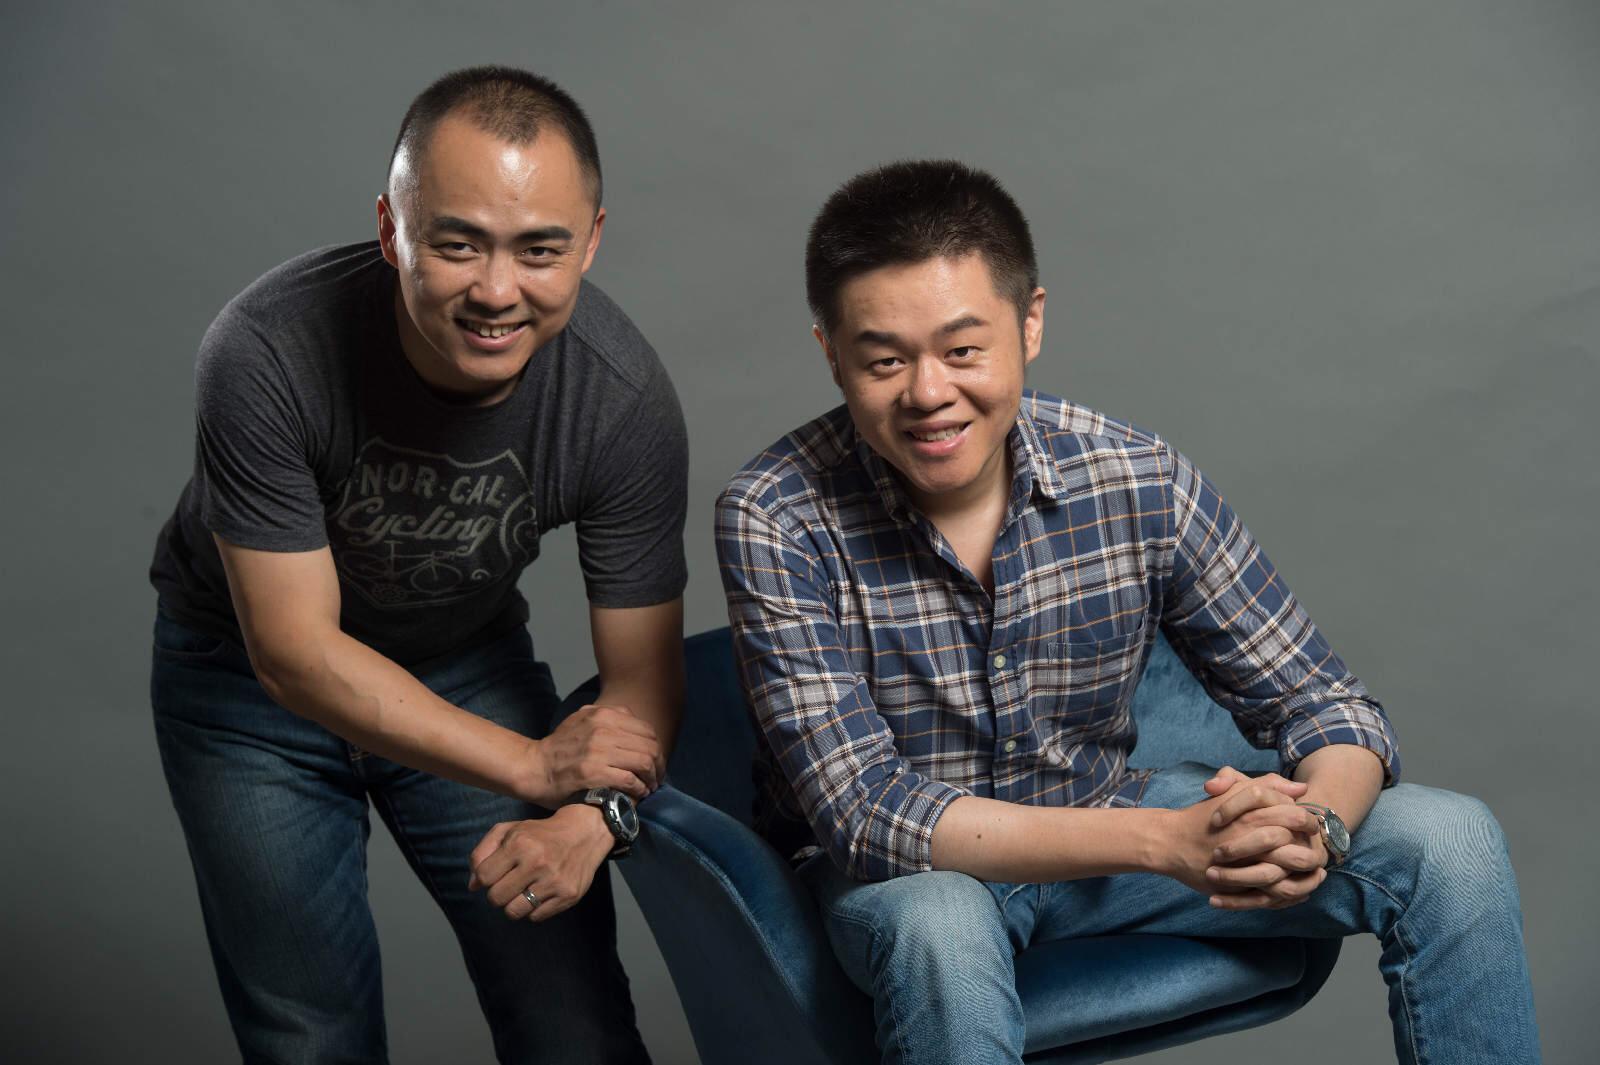 Left: Kuai Jiaqi, former CEO of Dada Right: Yang Jun, former CTO of Dada